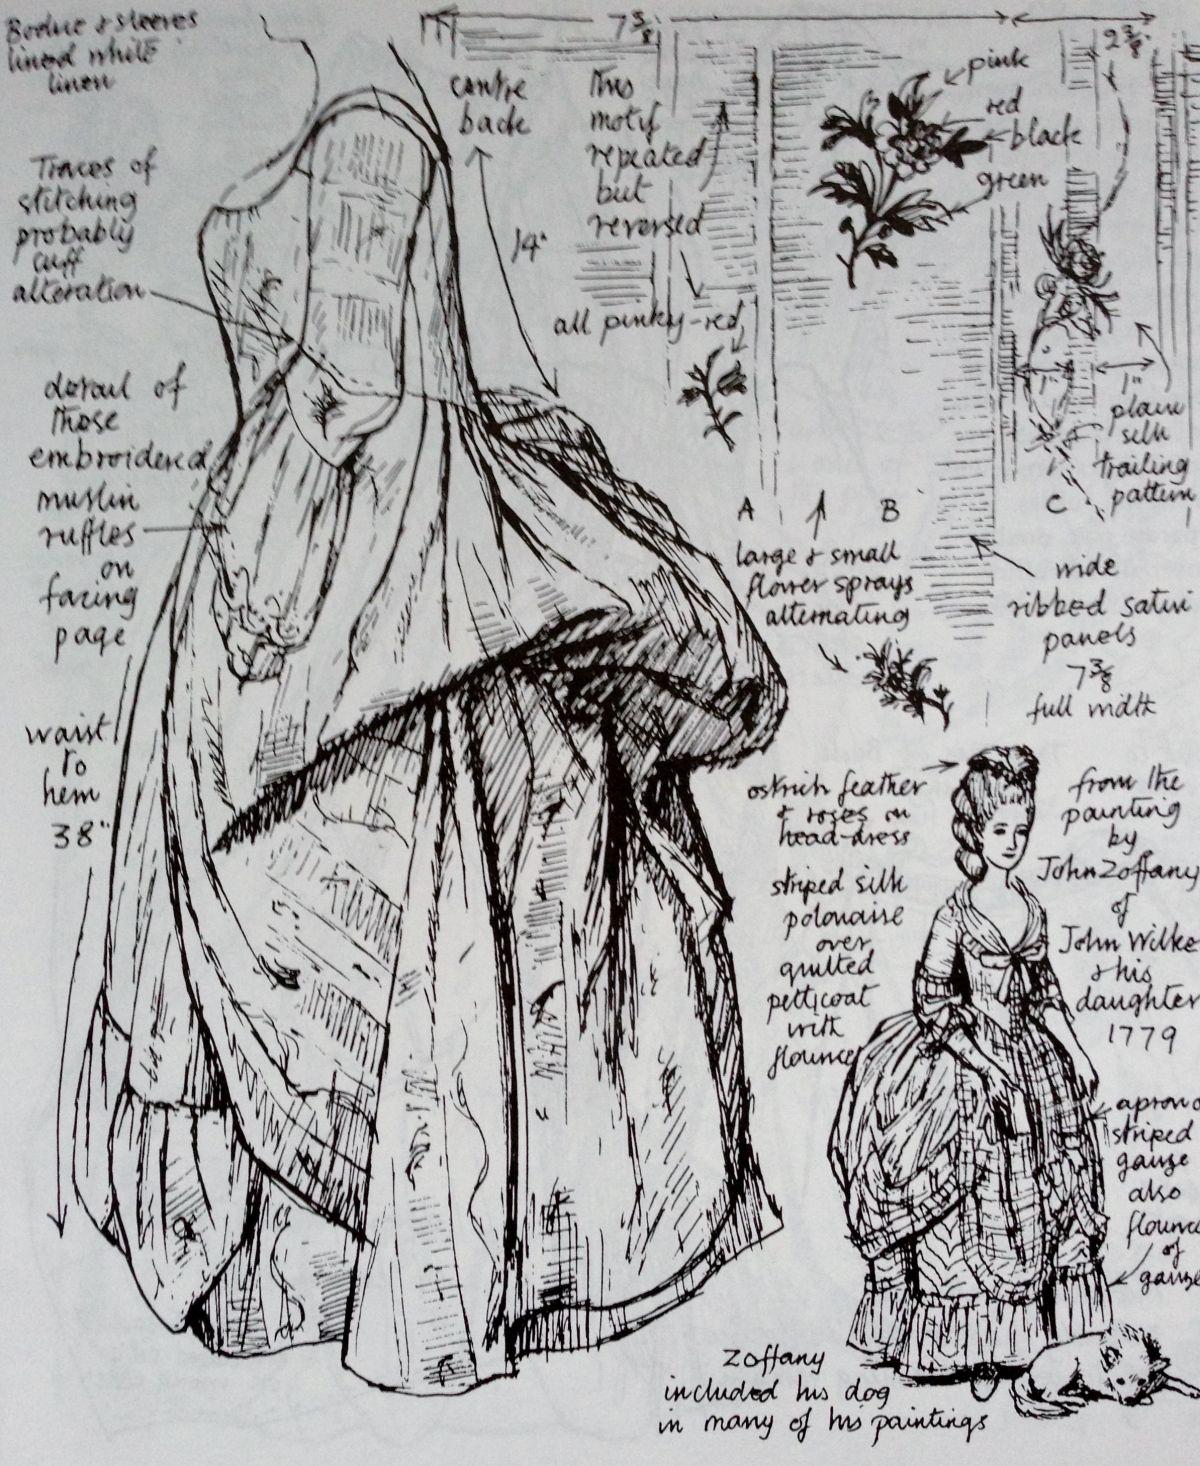 Nancy Bradfield Illstration Costume In Detail 1730 1930 Eric Dobby Publishing London 1968 Historical Costume 18th Century Costume 18th Century Fashion